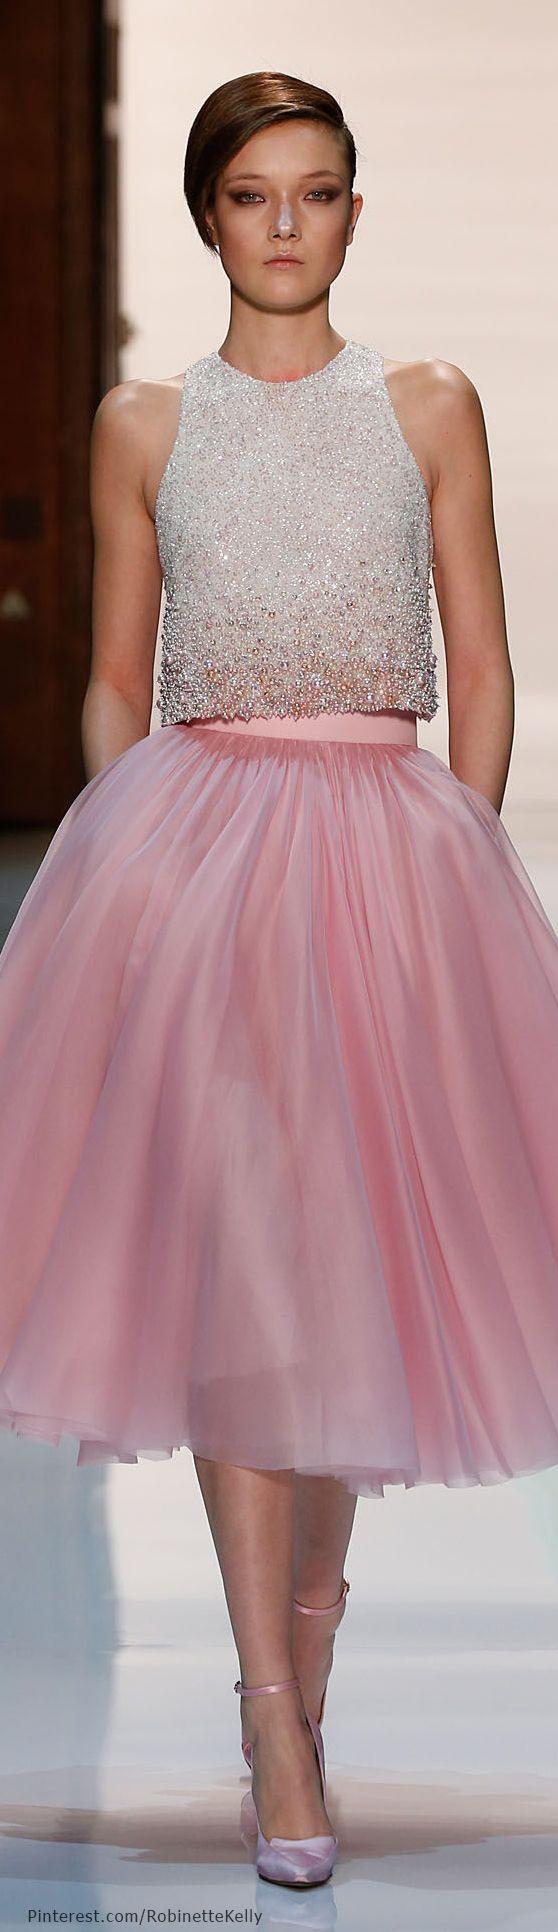 7de723807f 20 Fashionable Tulle Skirt Outfits for Summer - crazyforus